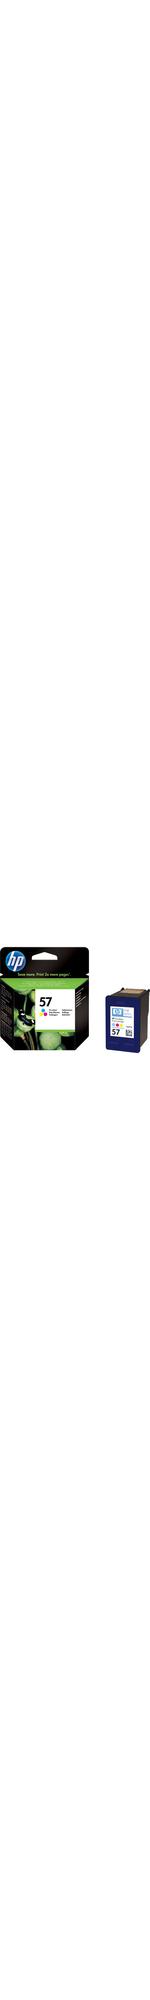 HP No. 57 Ink Cartridge - Cyan, Magenta, Yellow